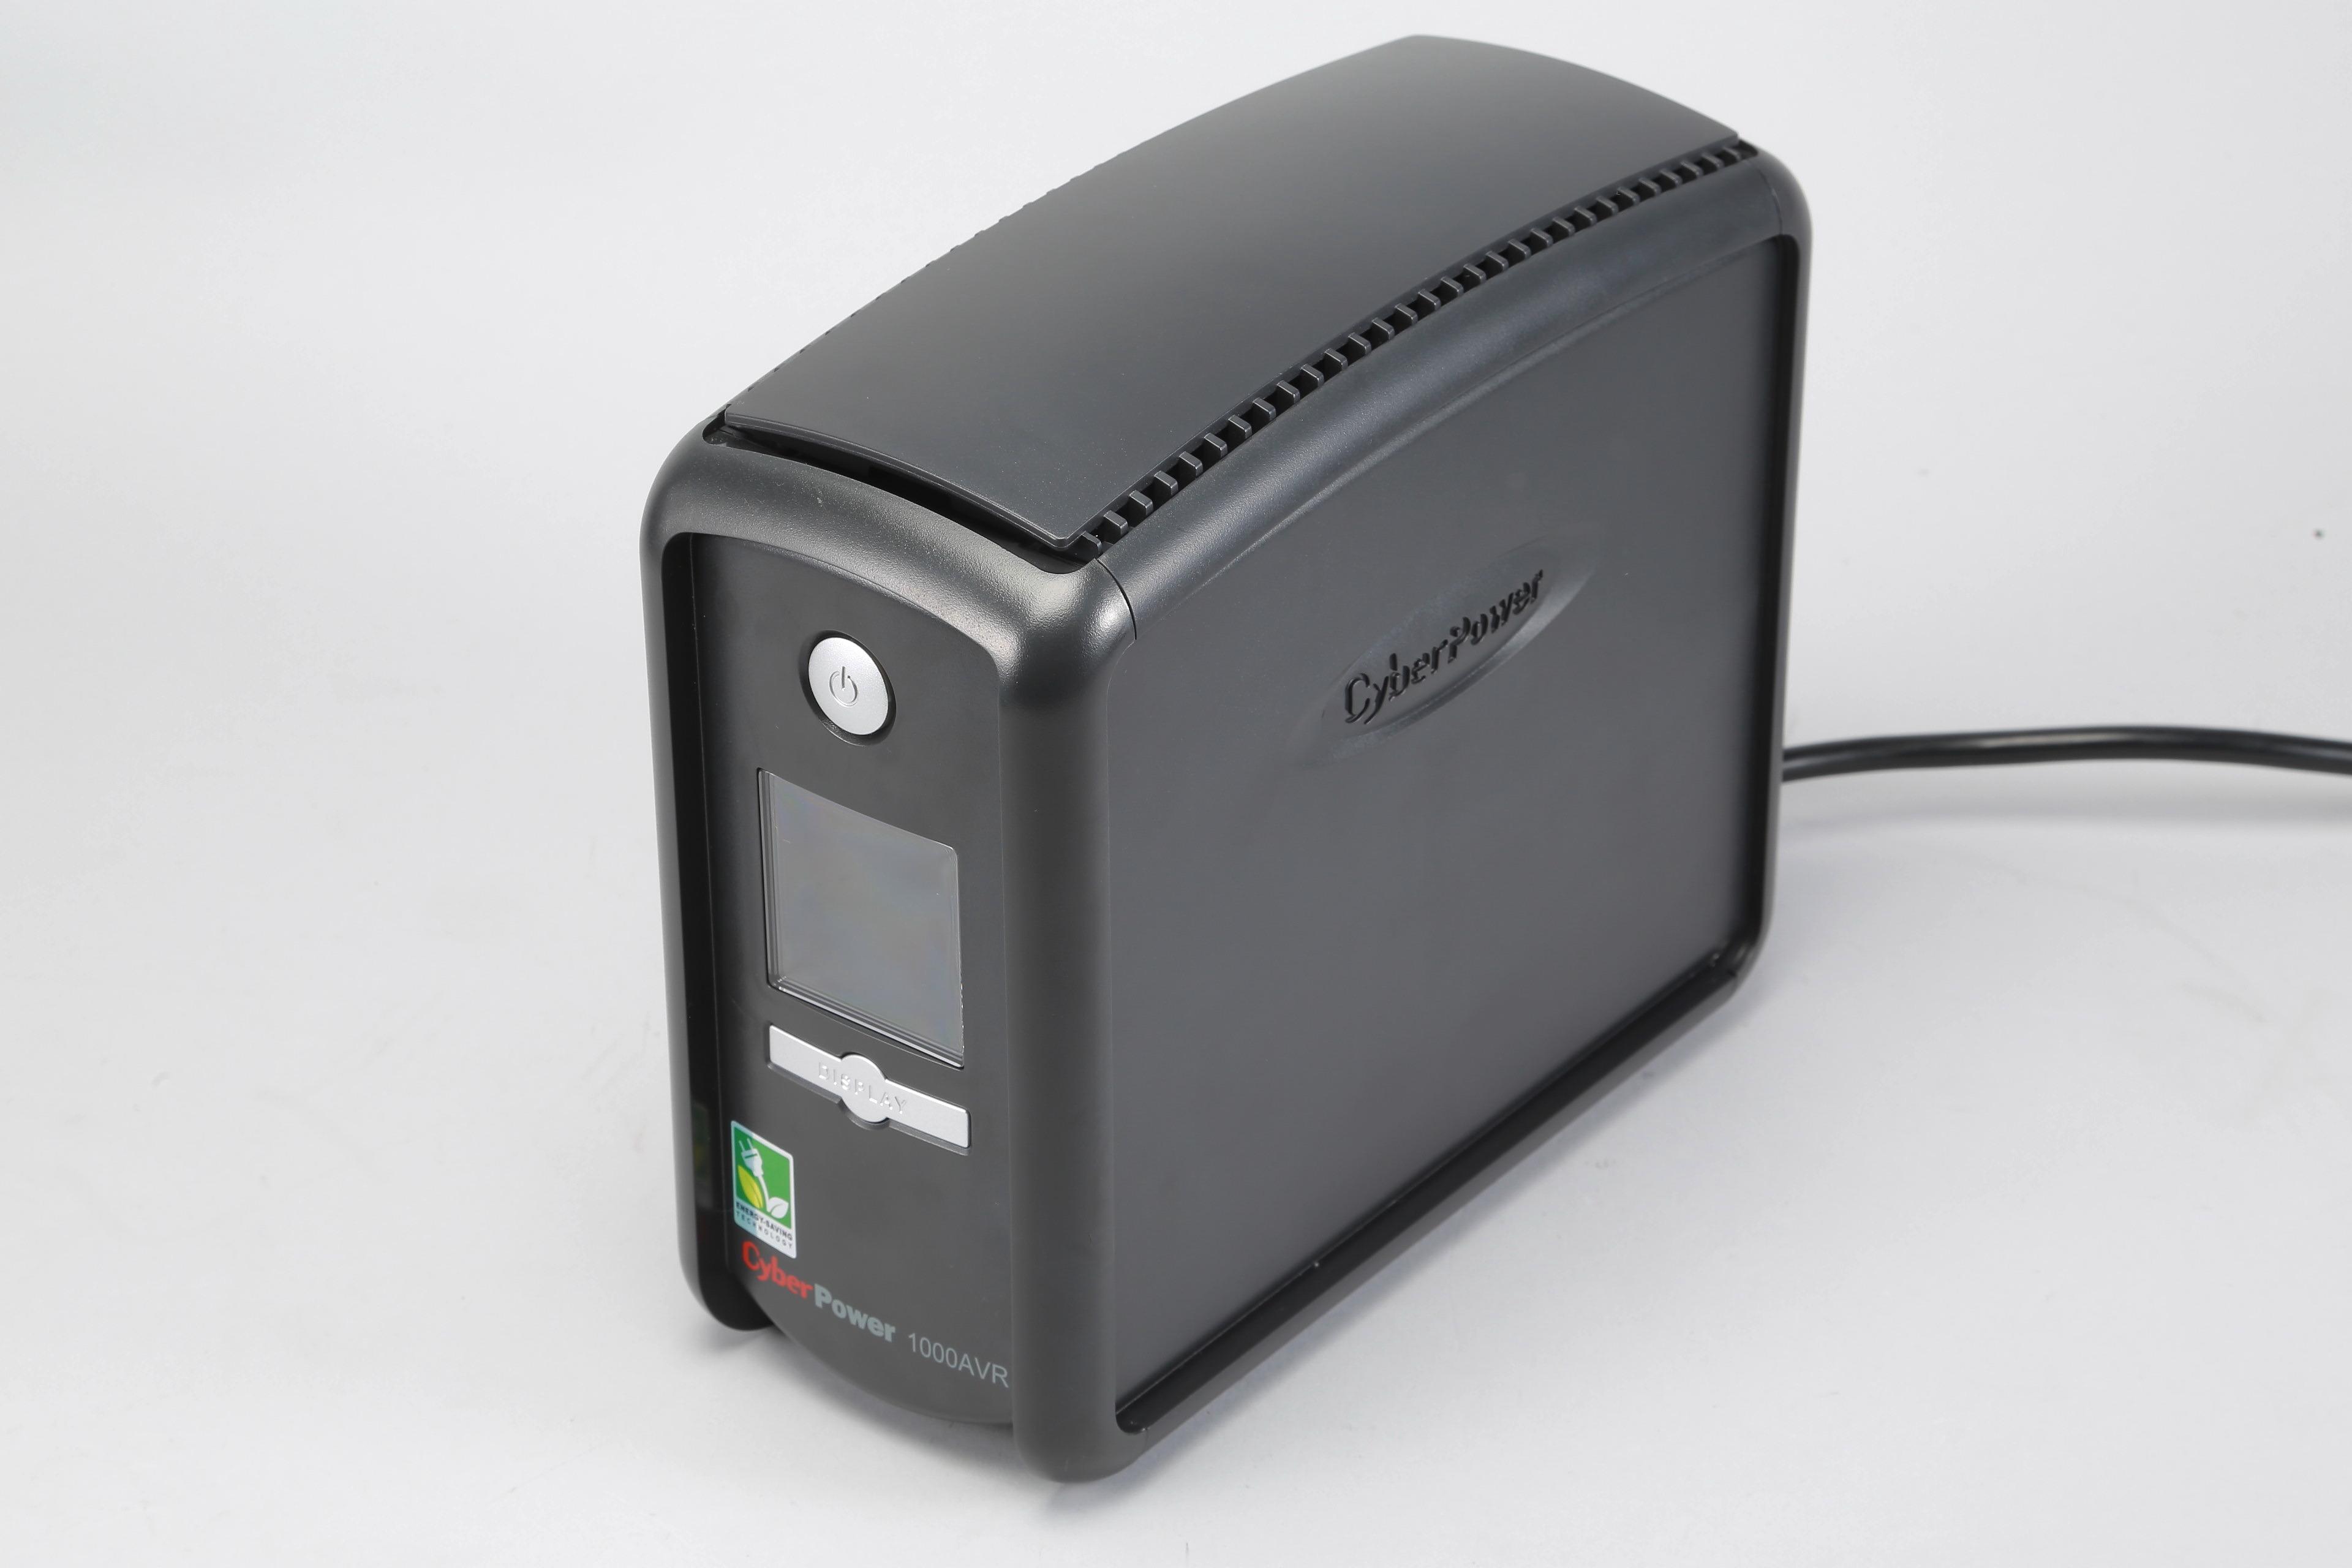 CyberPower CP1000AVRLCD:支援 LCD 顯示的 UPS